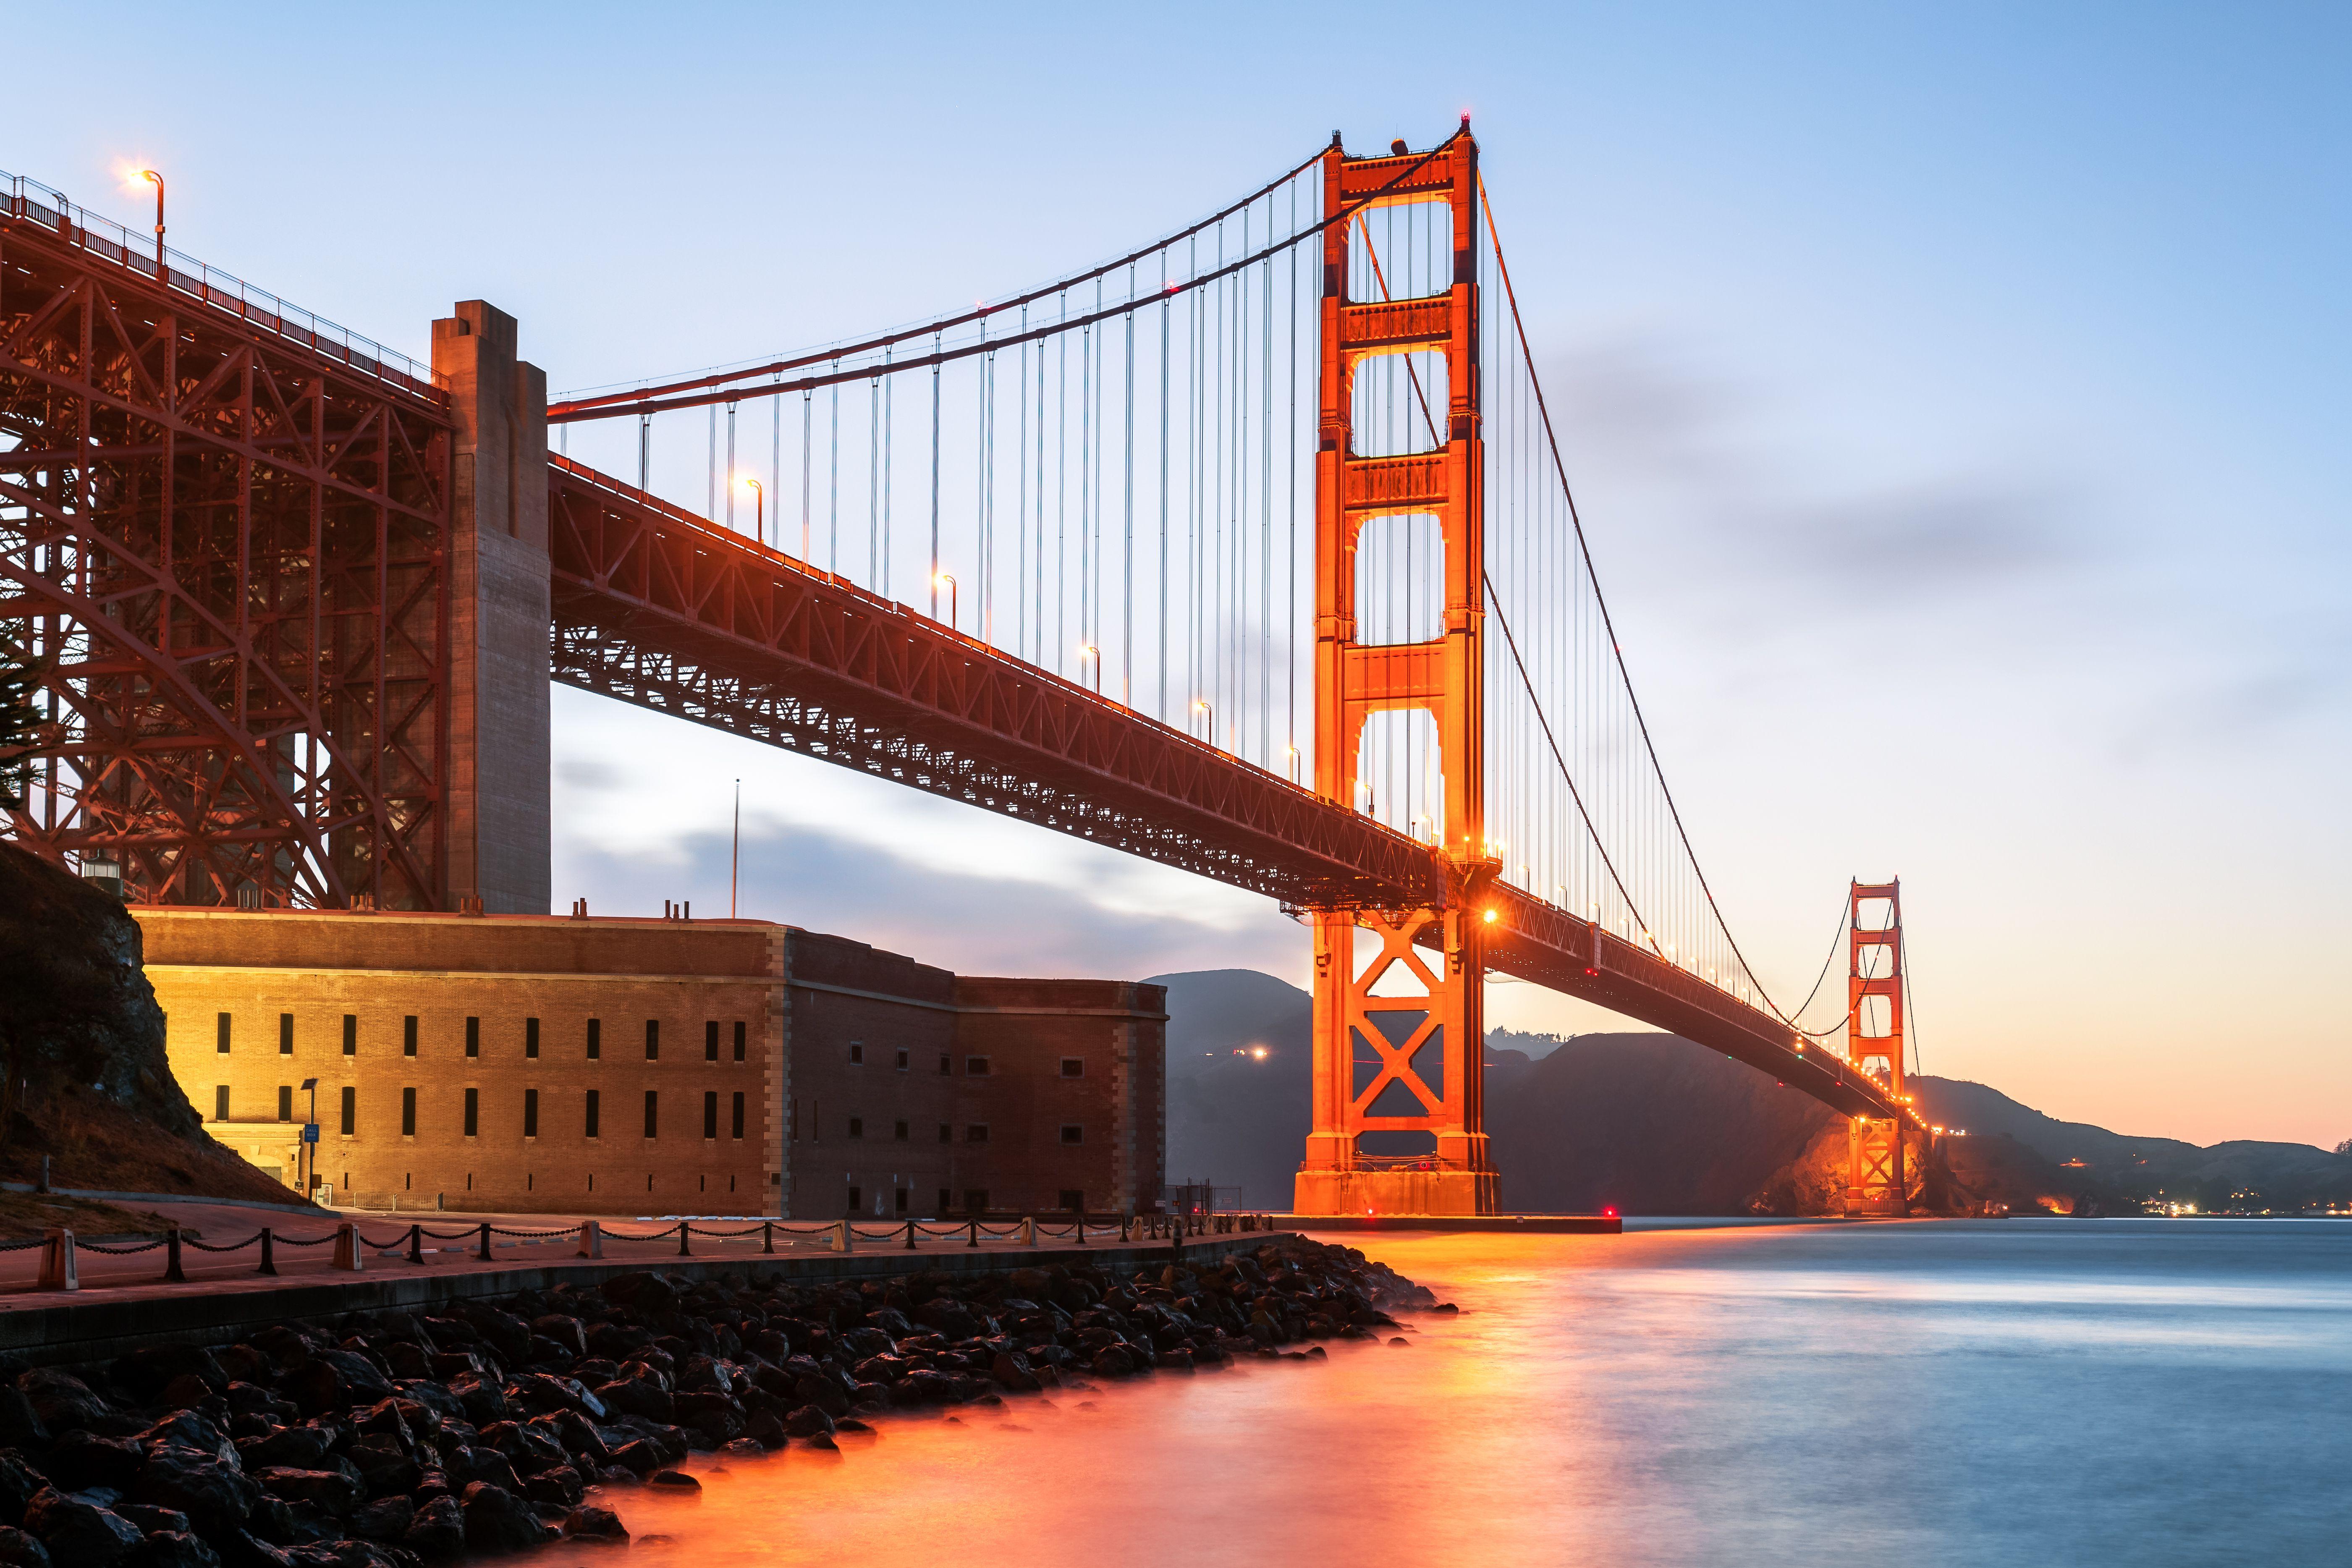 Fort below Golden Gate Bridge at sunset